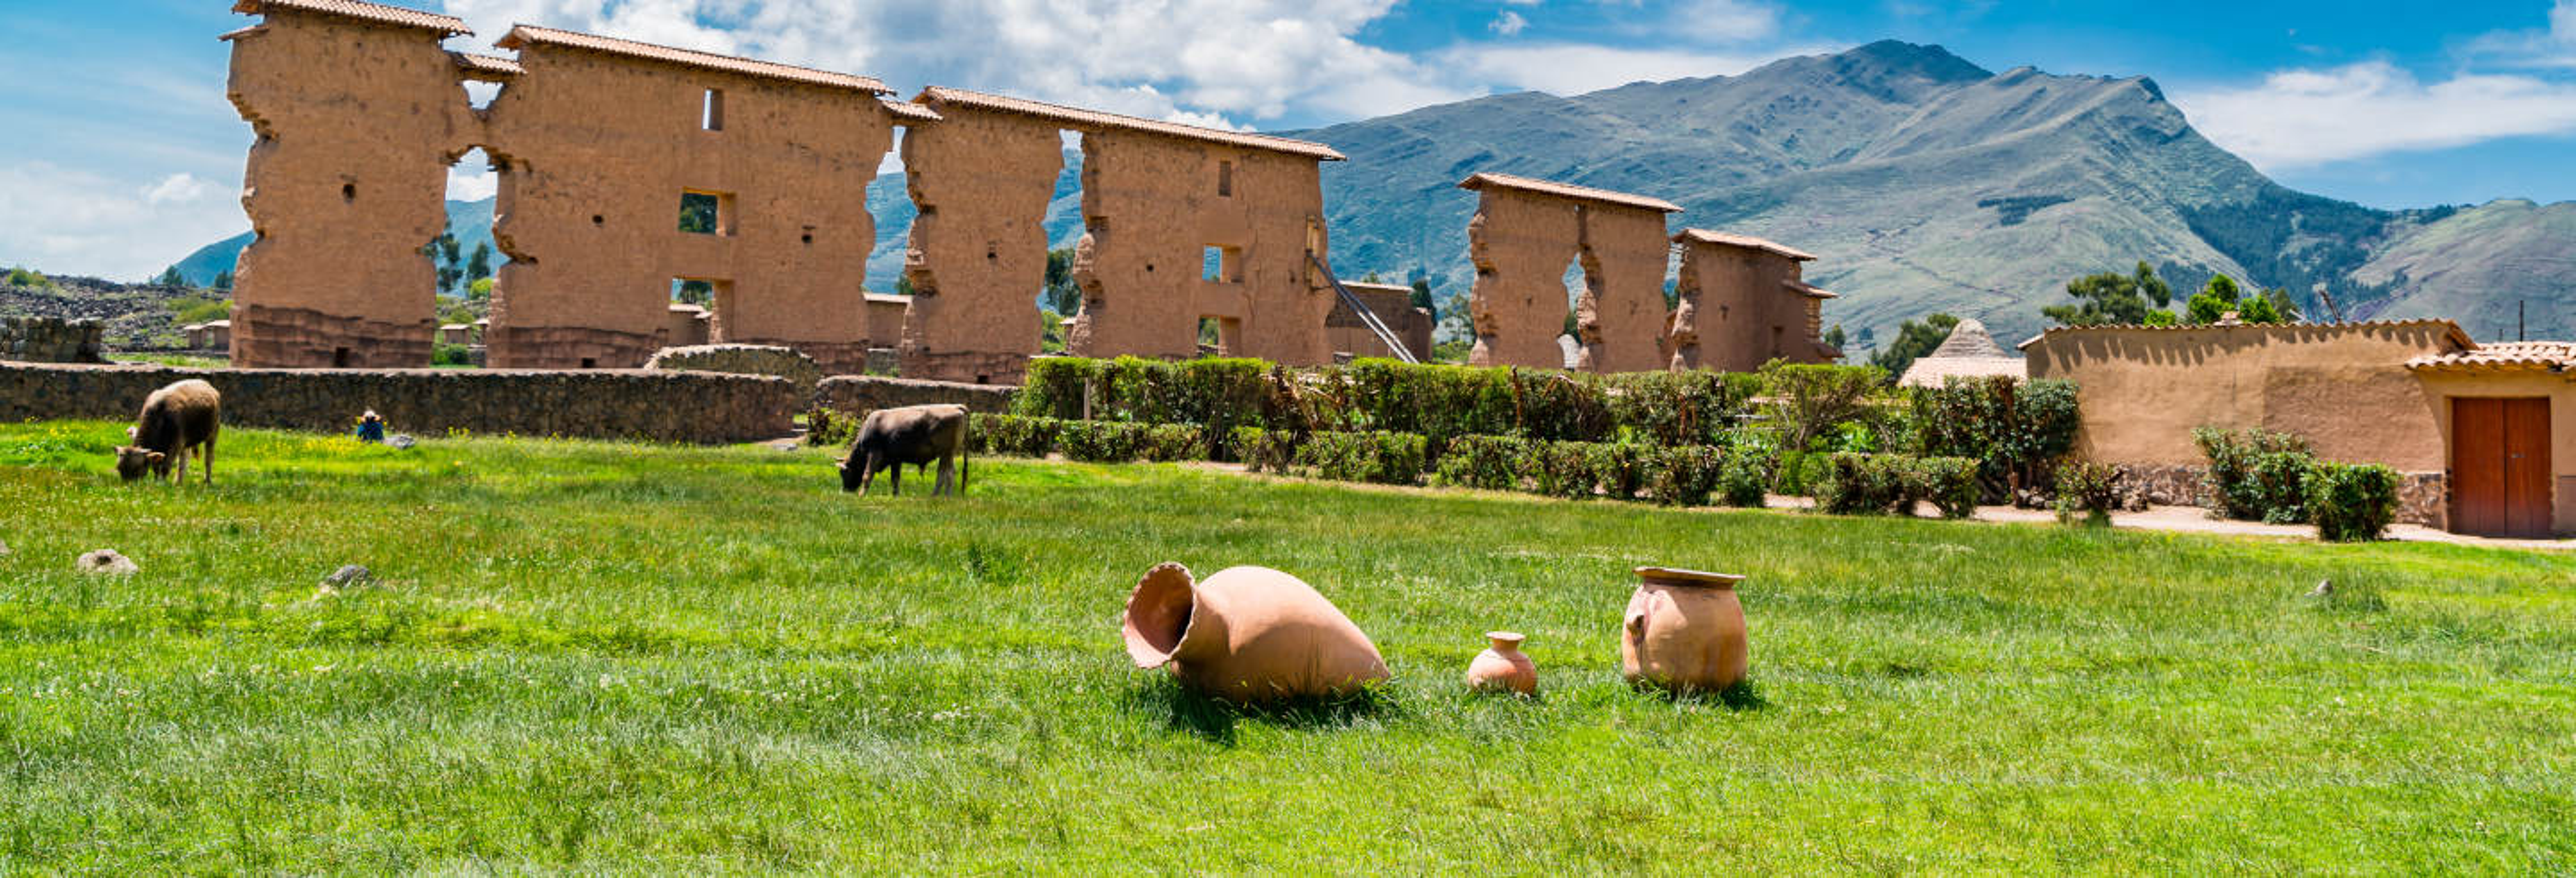 Ruta del Sol desde Cusco hasta Puno